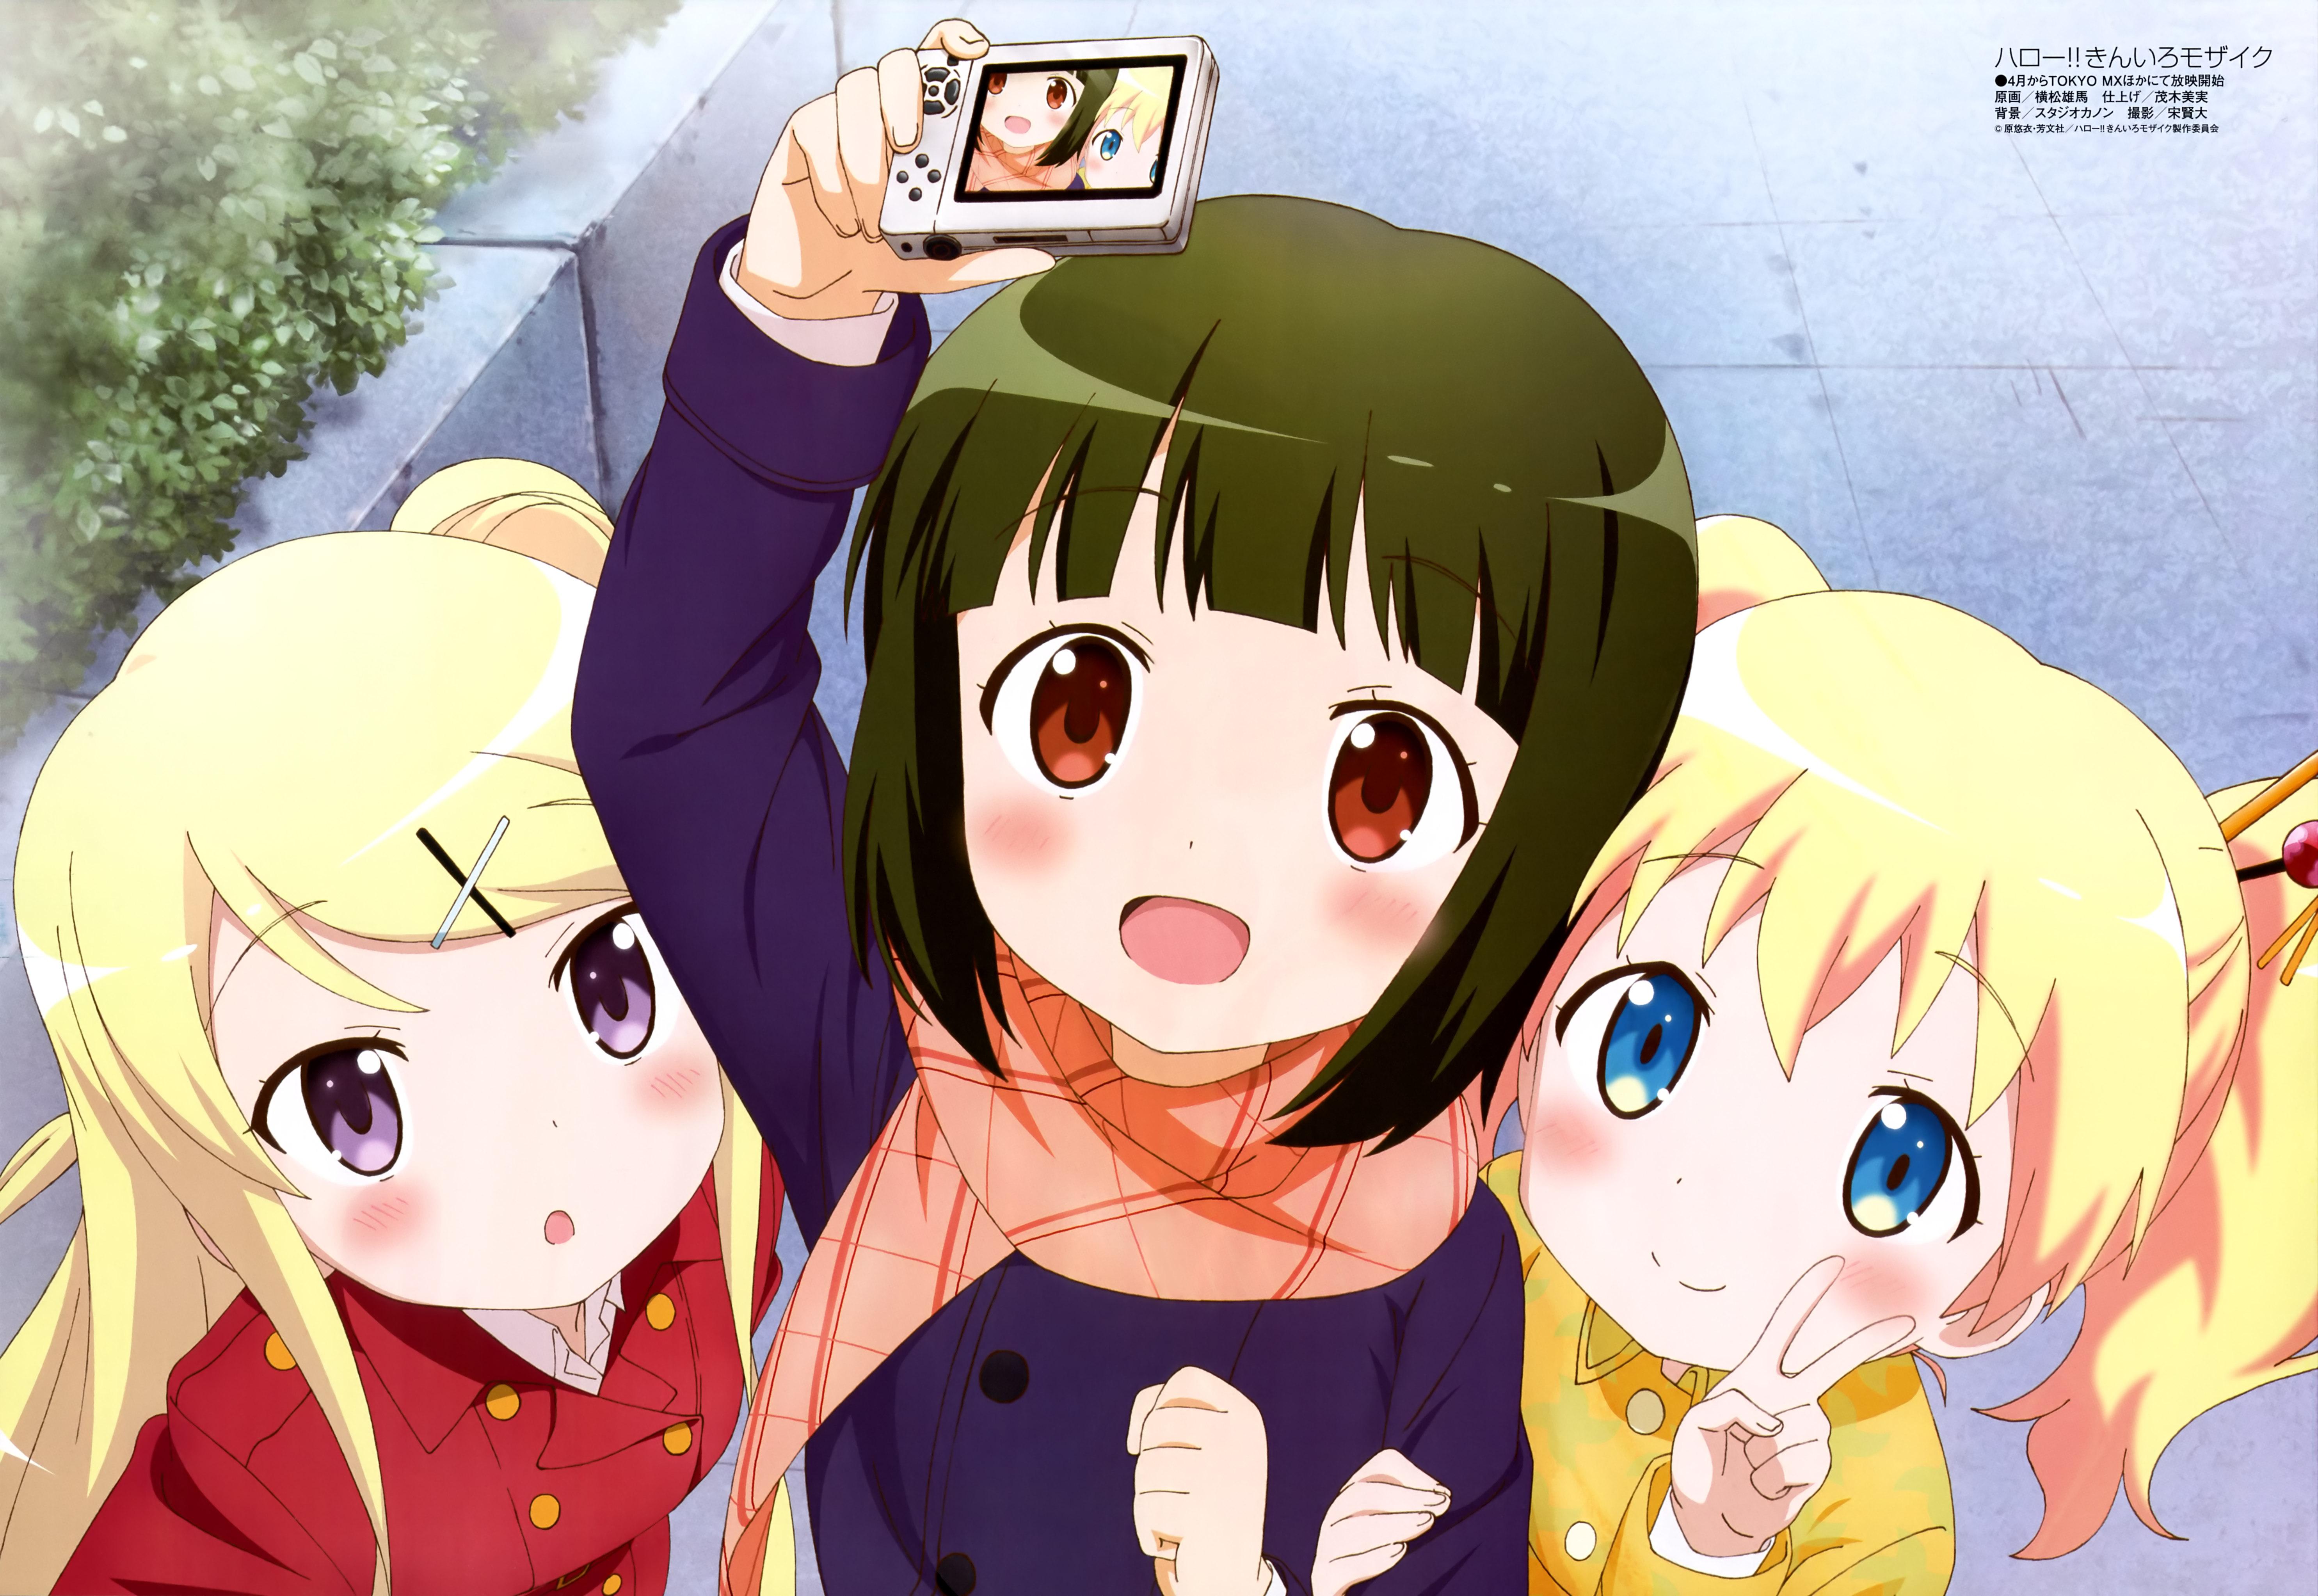 Megami MAGAZINE March 2015 anime posters Haruhichan.com kiniro mosaic poster